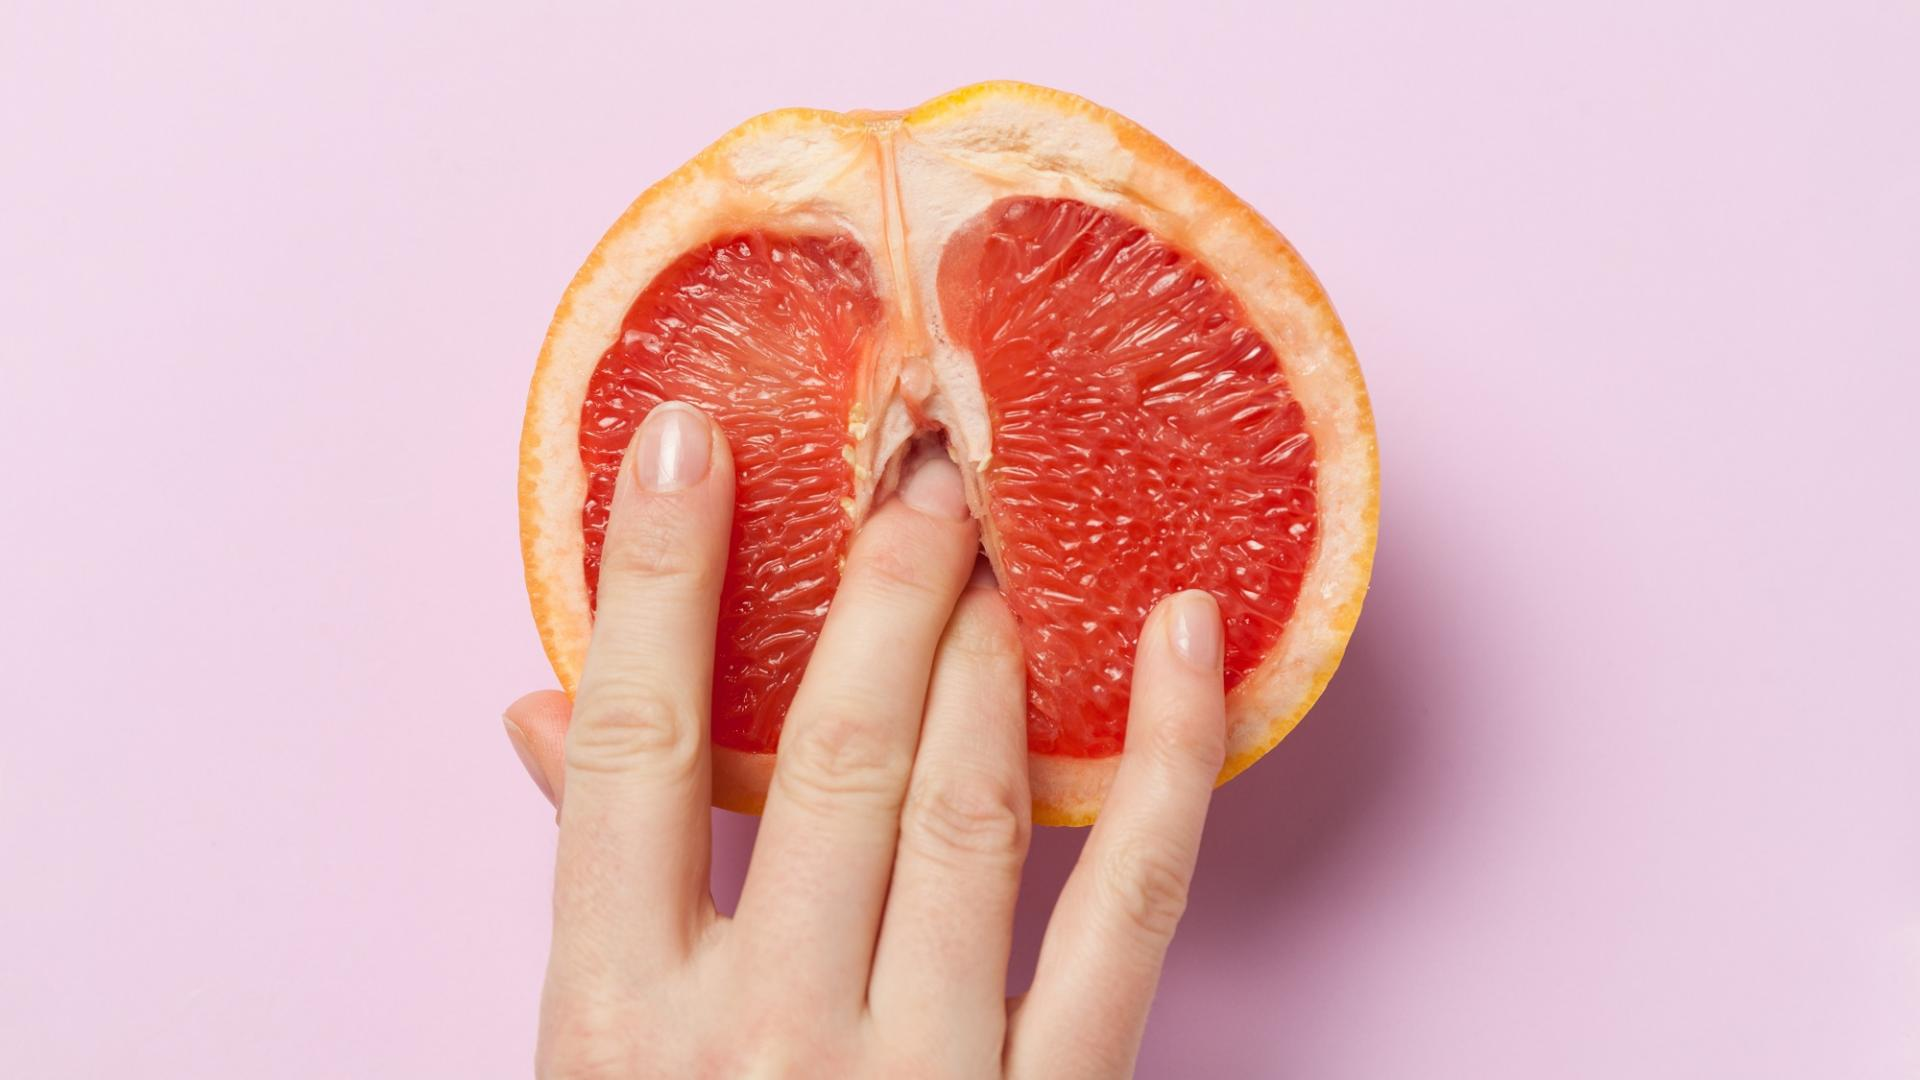 Frucht, Selbstbefriedigung